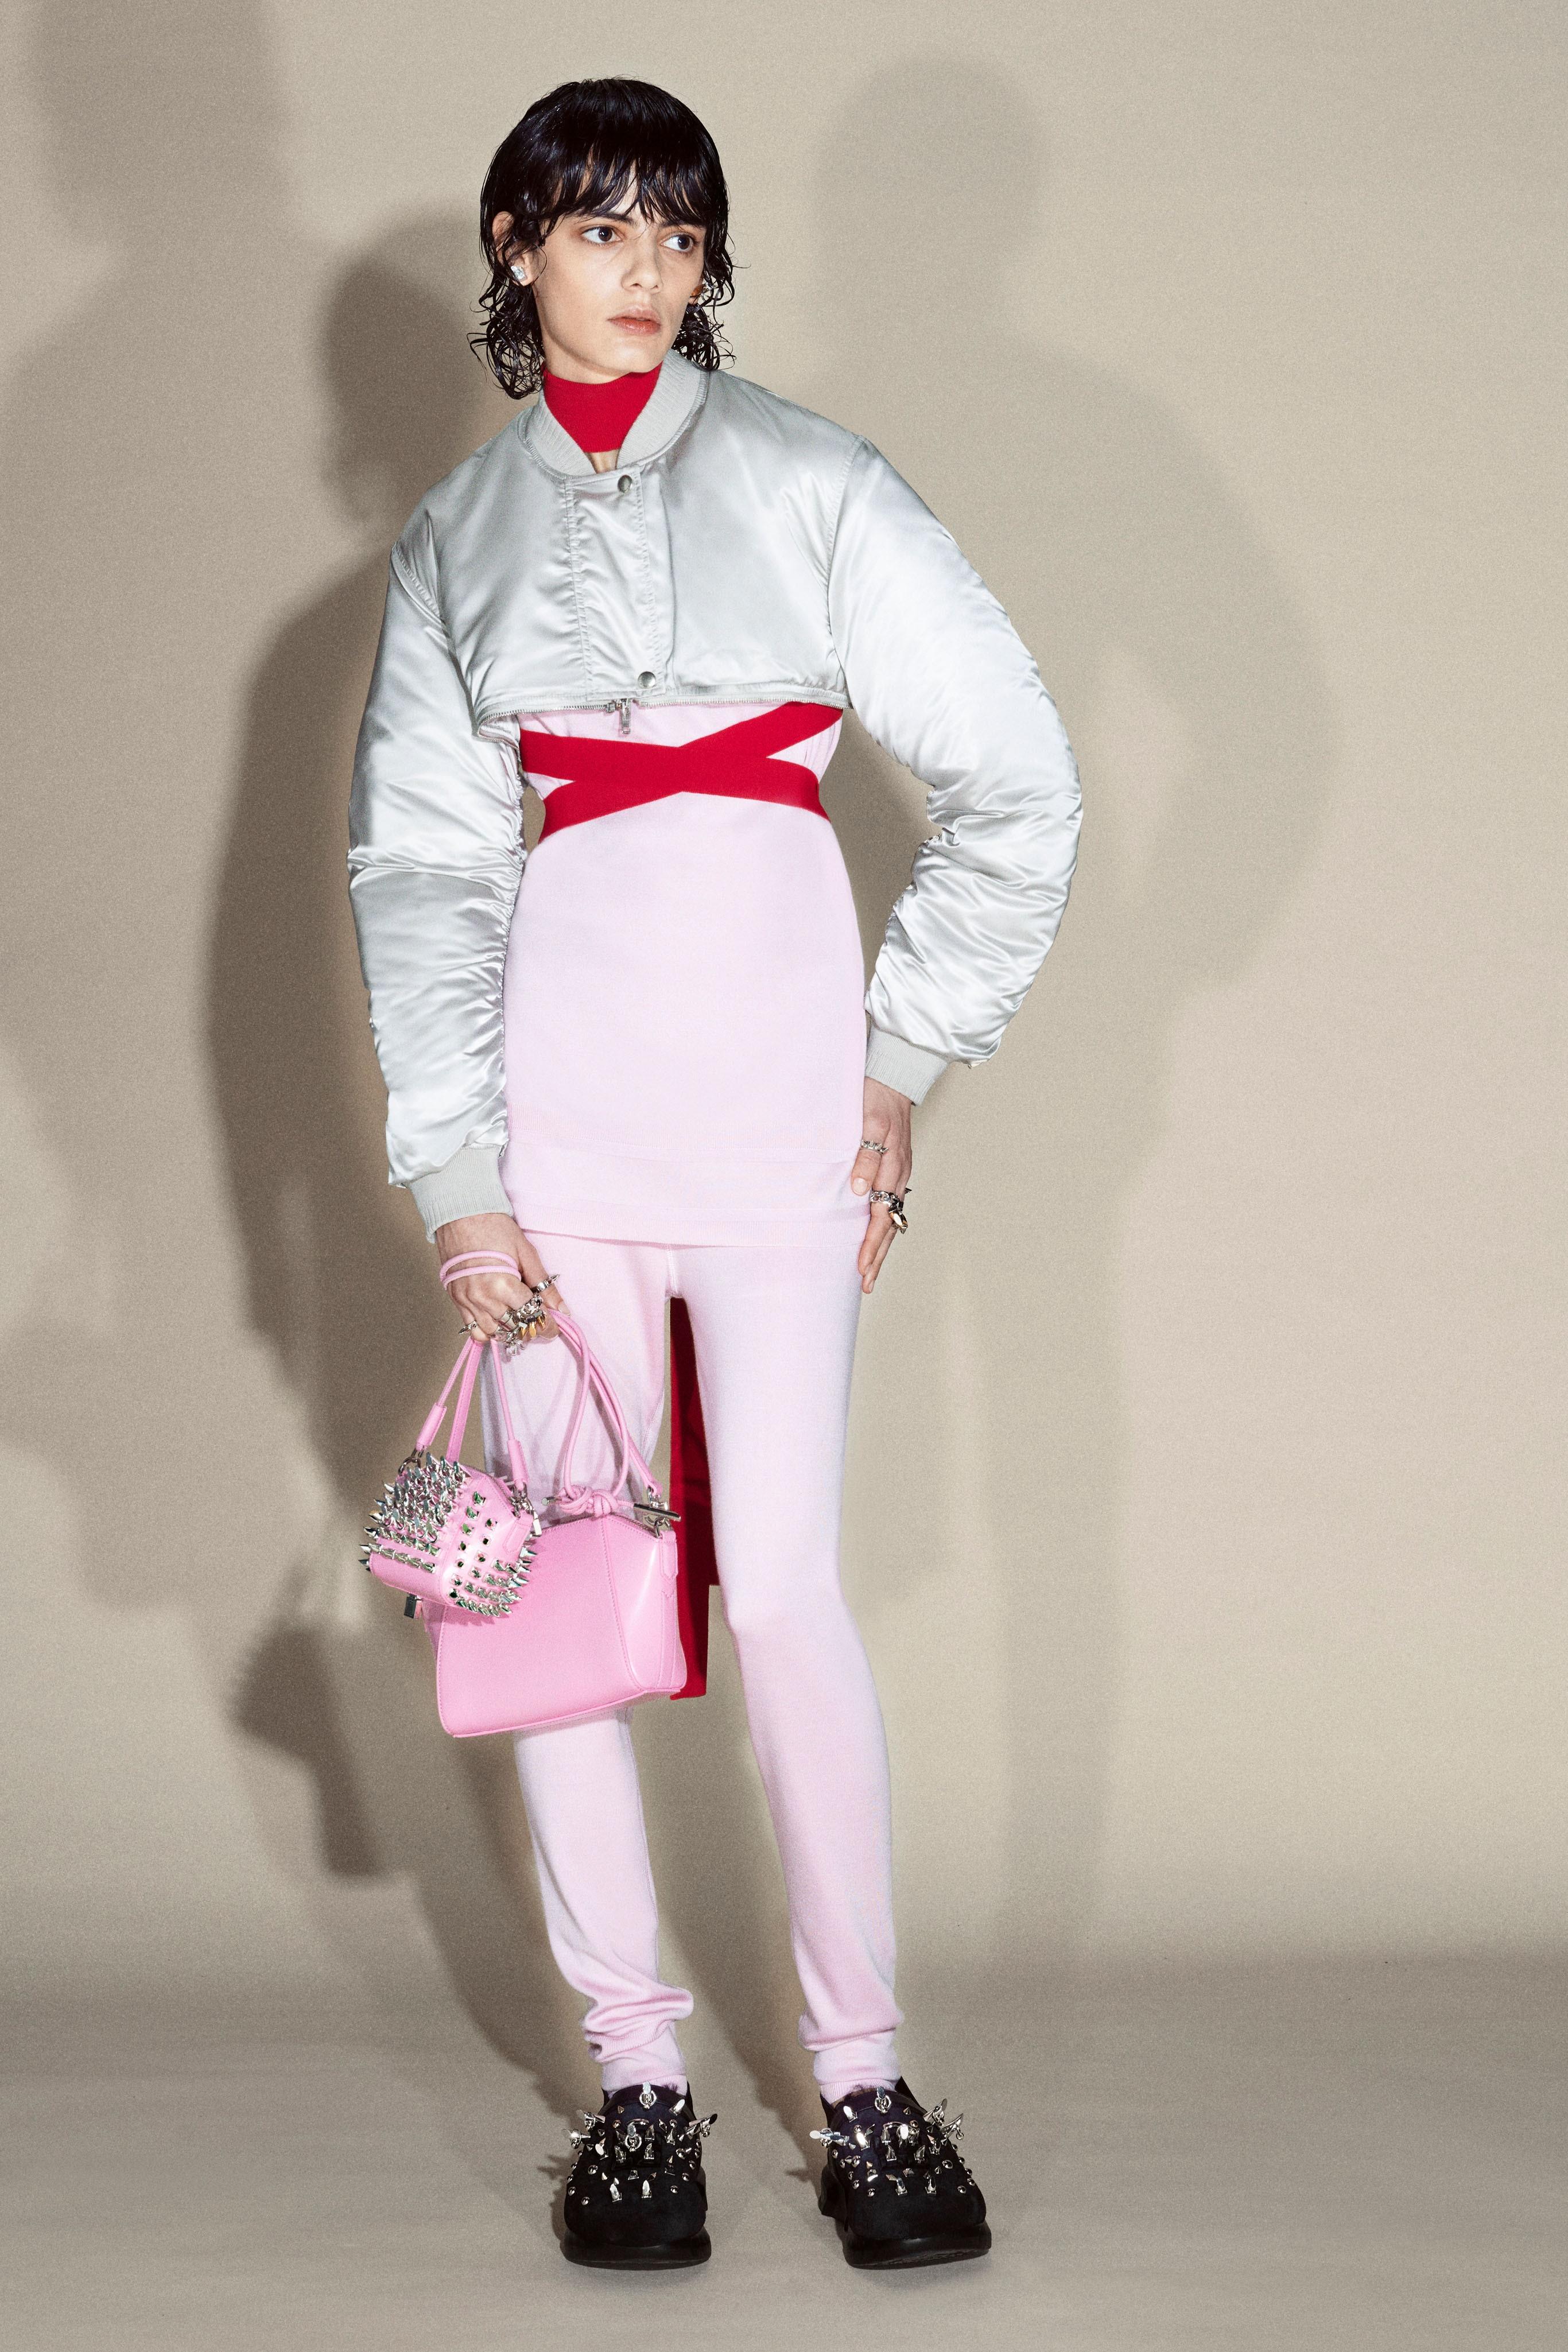 00013-Givenchy-Pre-Fall-21